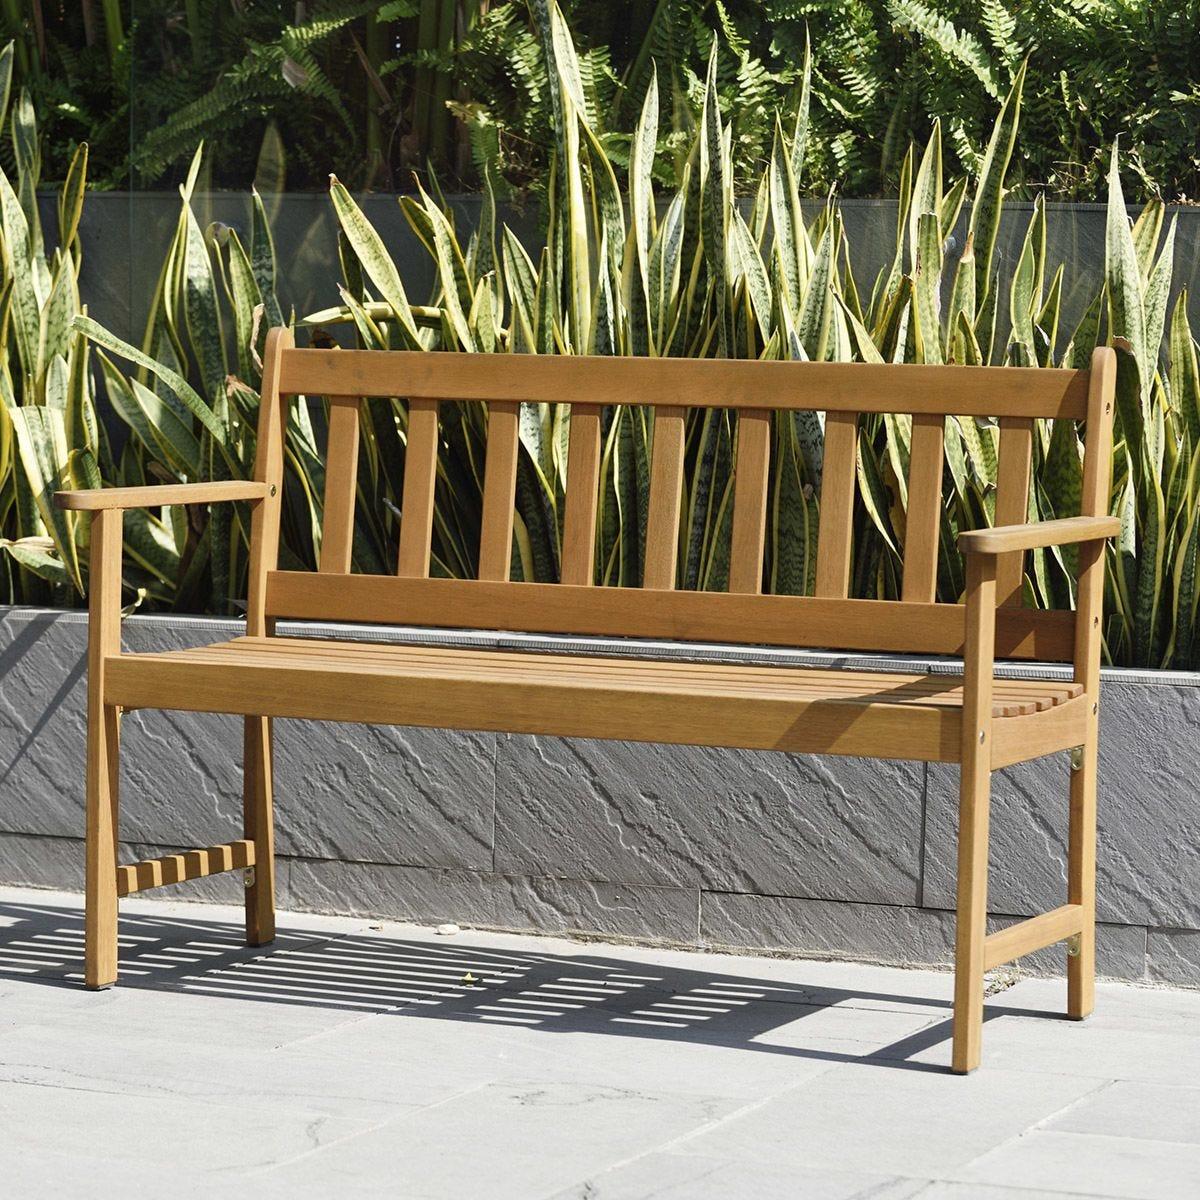 Lamu 2 Seater Eucalyptus FSC Wooden Bench